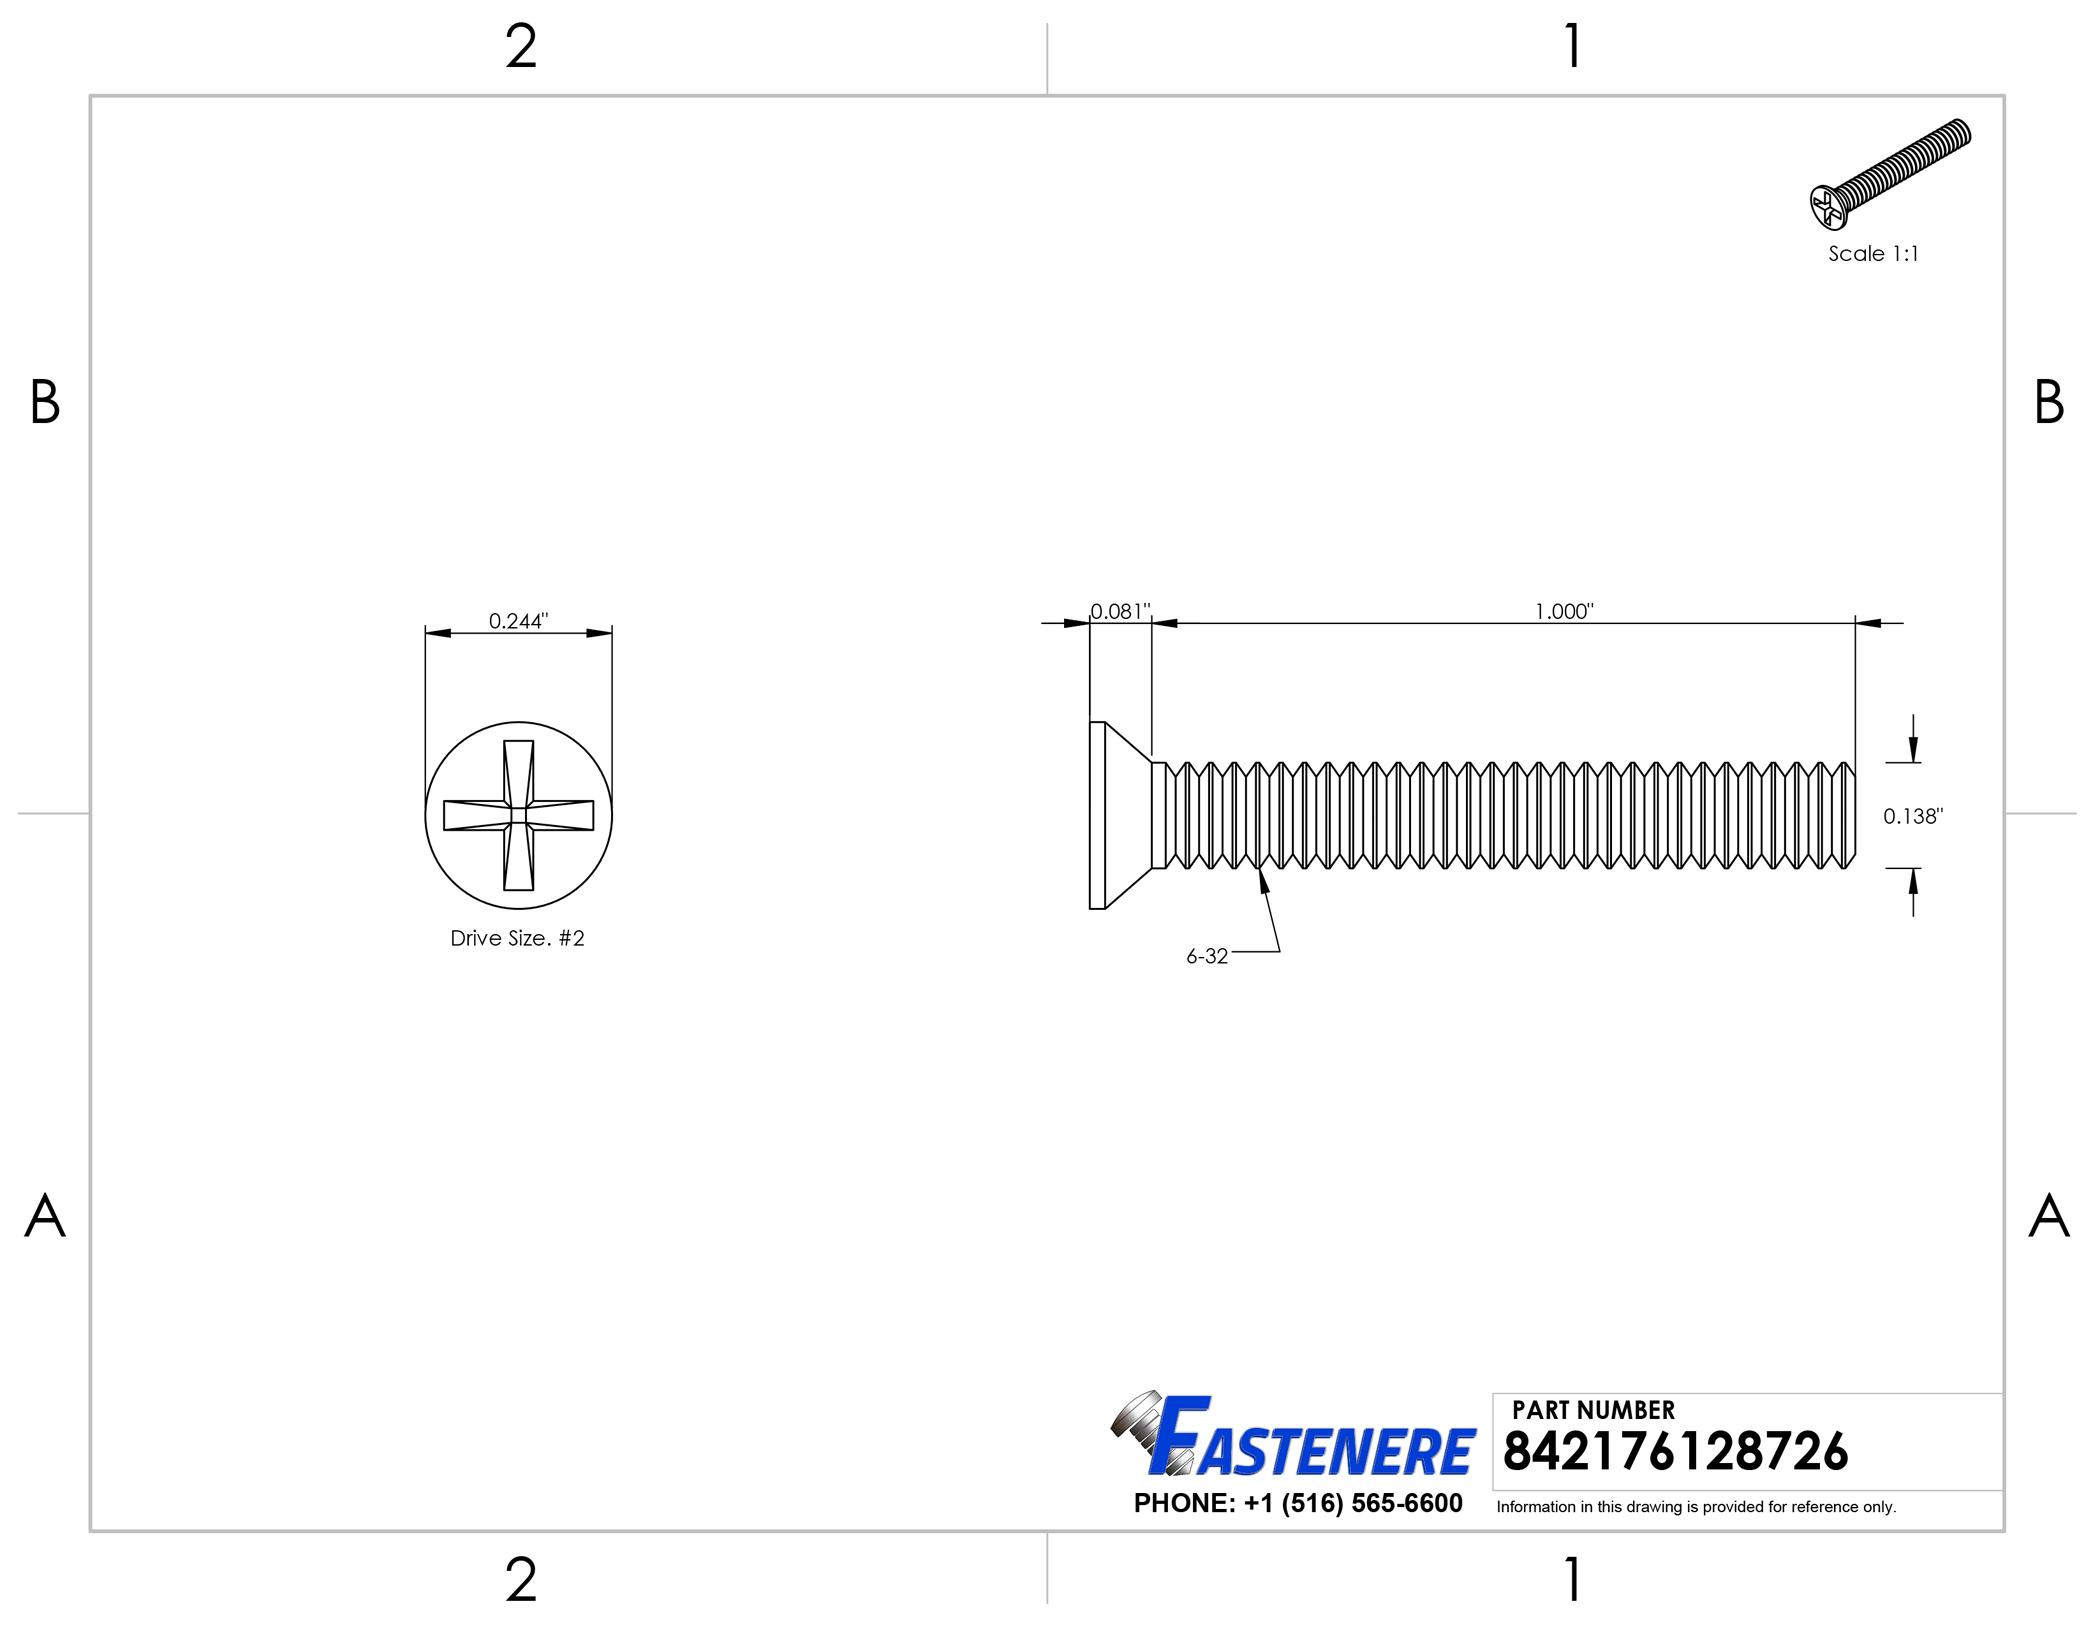 #6-32 Flat Head Machine Screws Assortment Kit Stainless Steel Qty110 Phillips